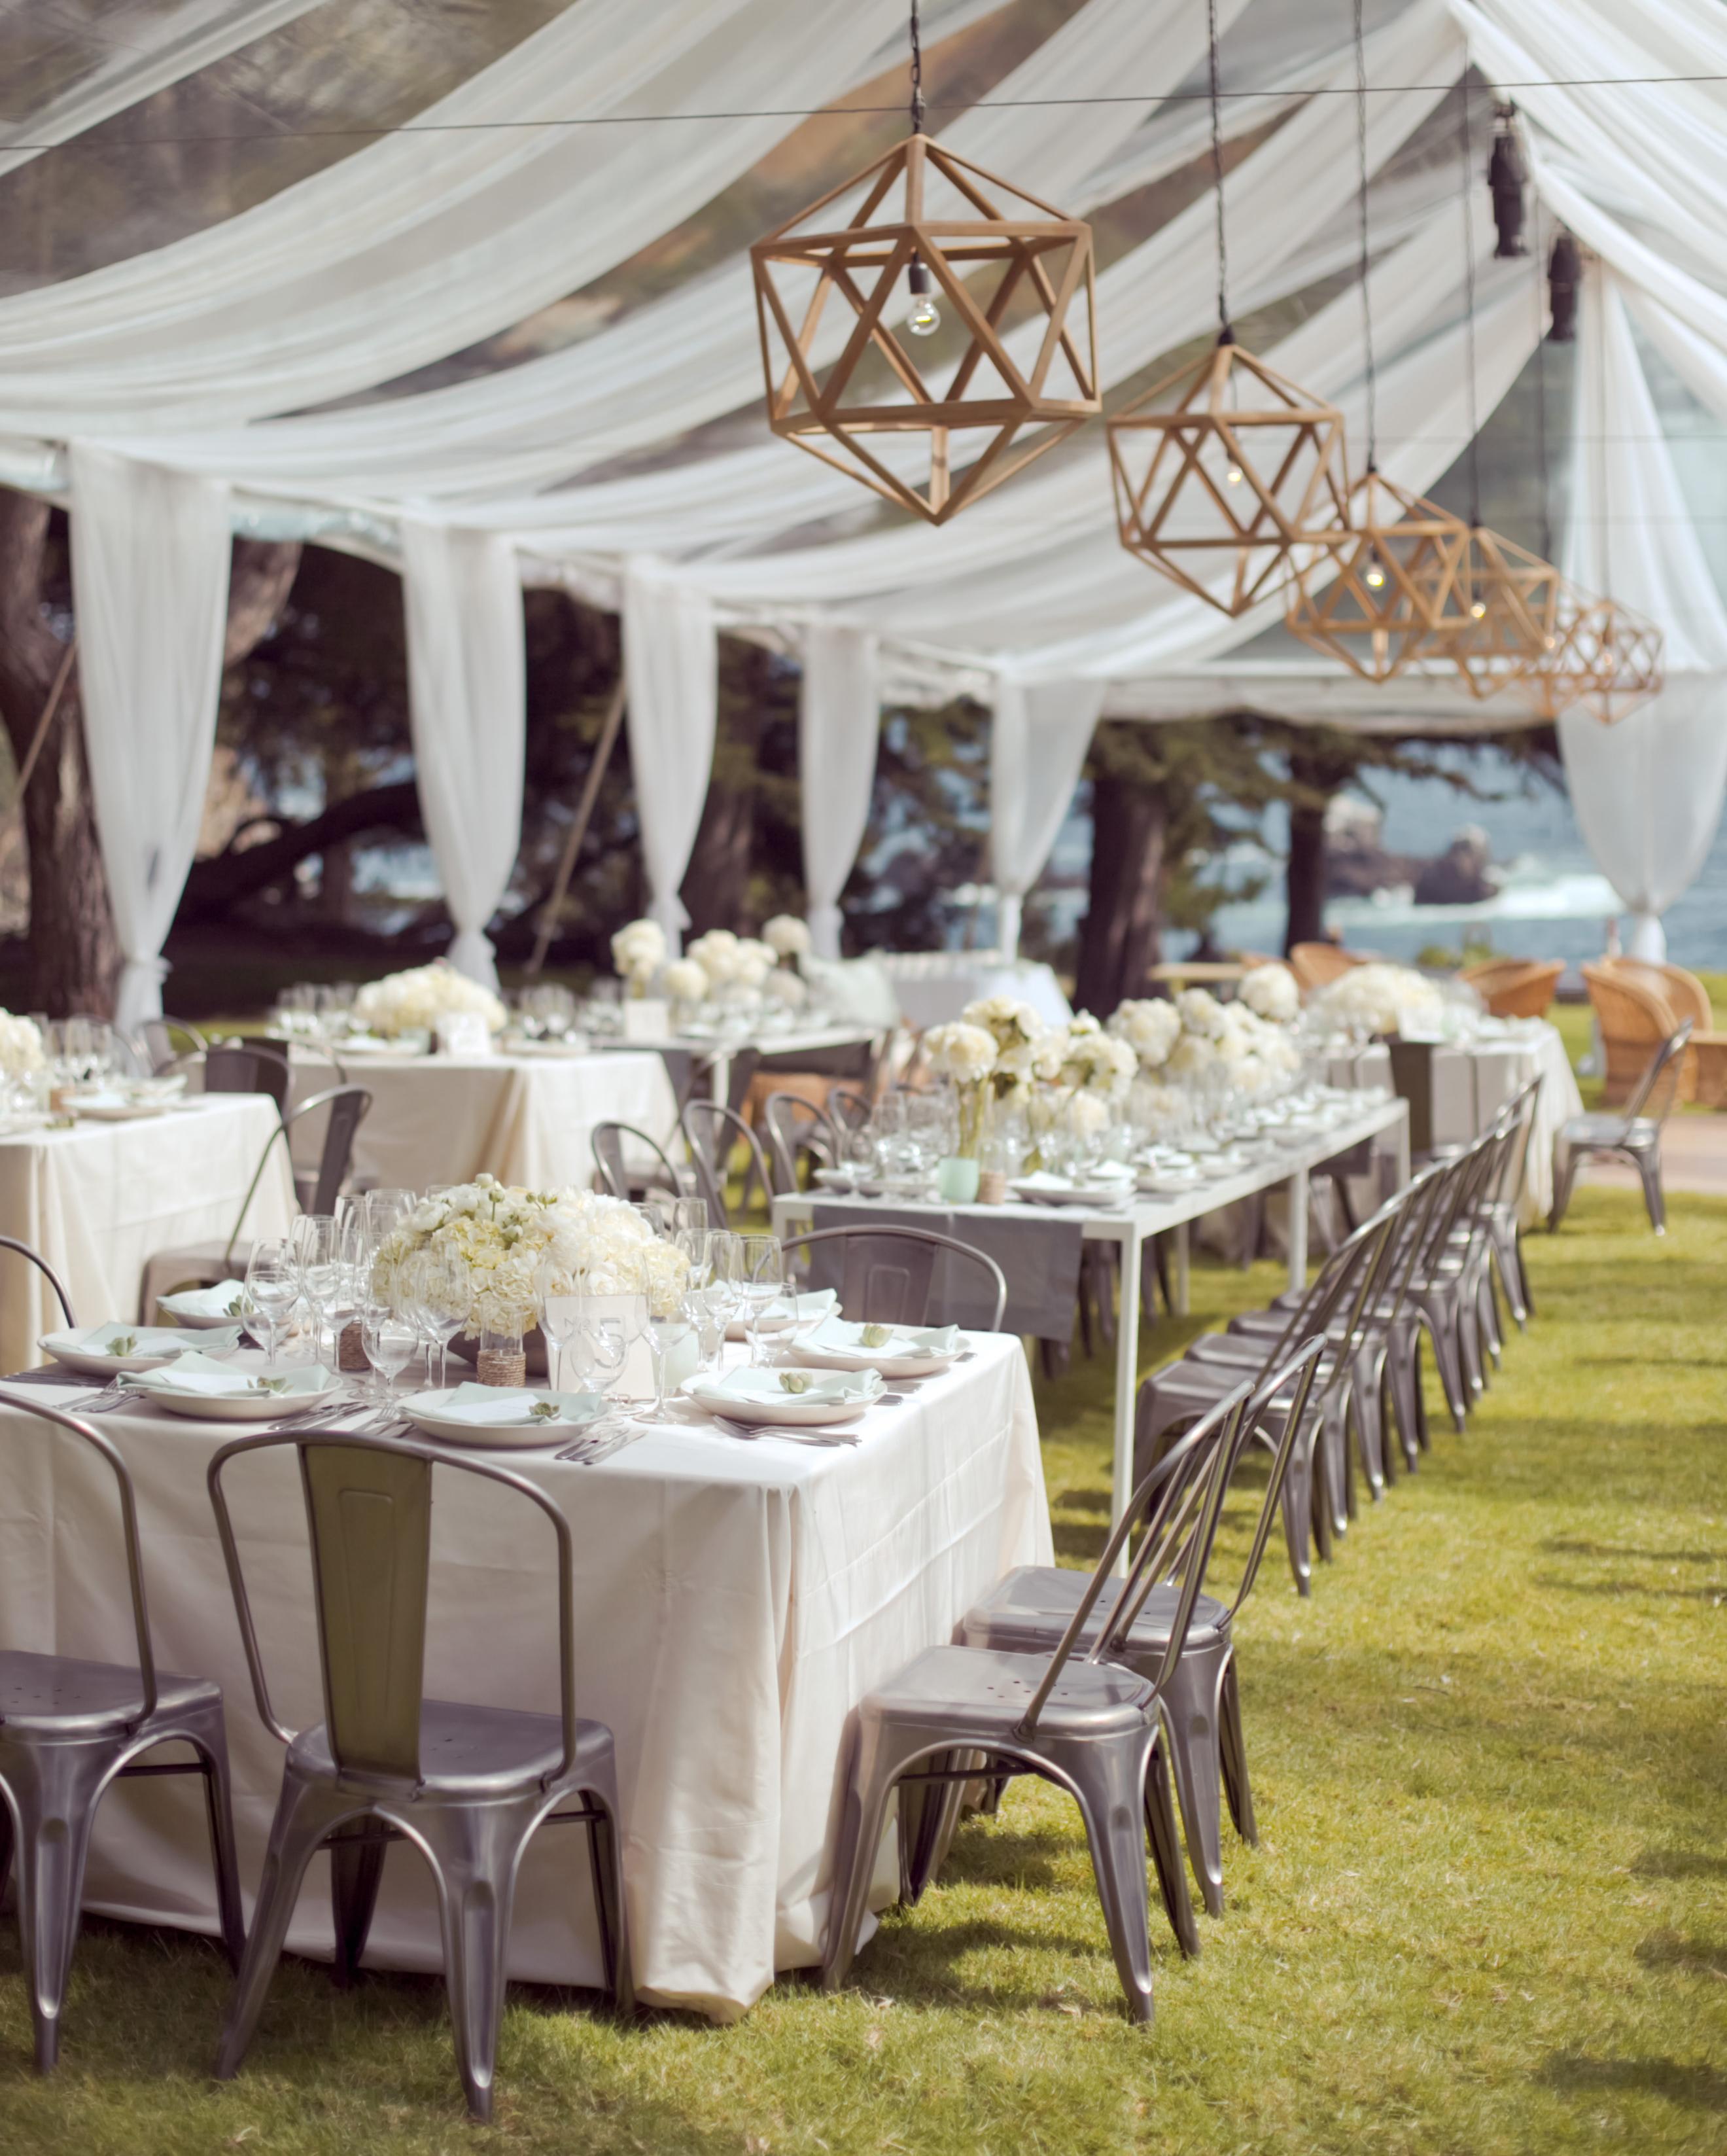 emma-michelle-wedding-tent-0202-s112079-0715.jpg